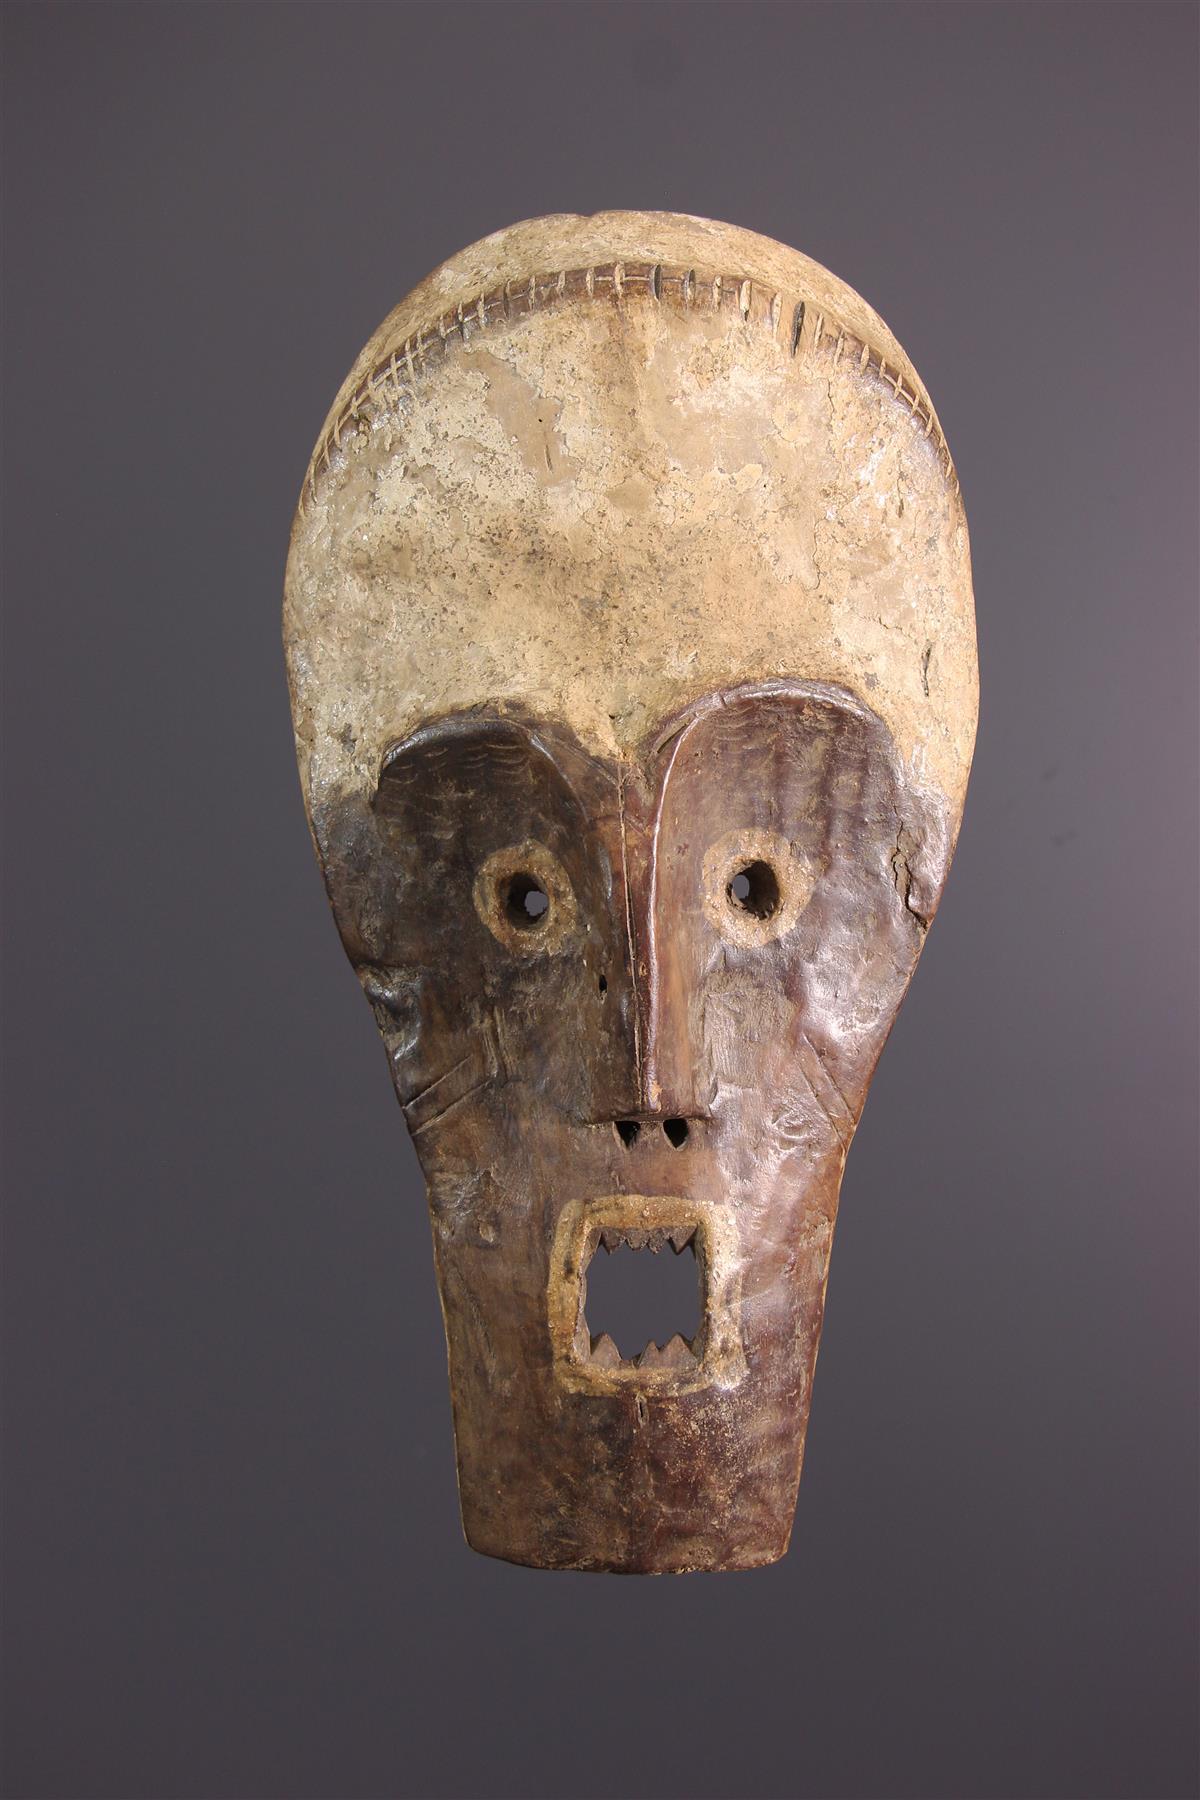 Songola Mask - Tribal art